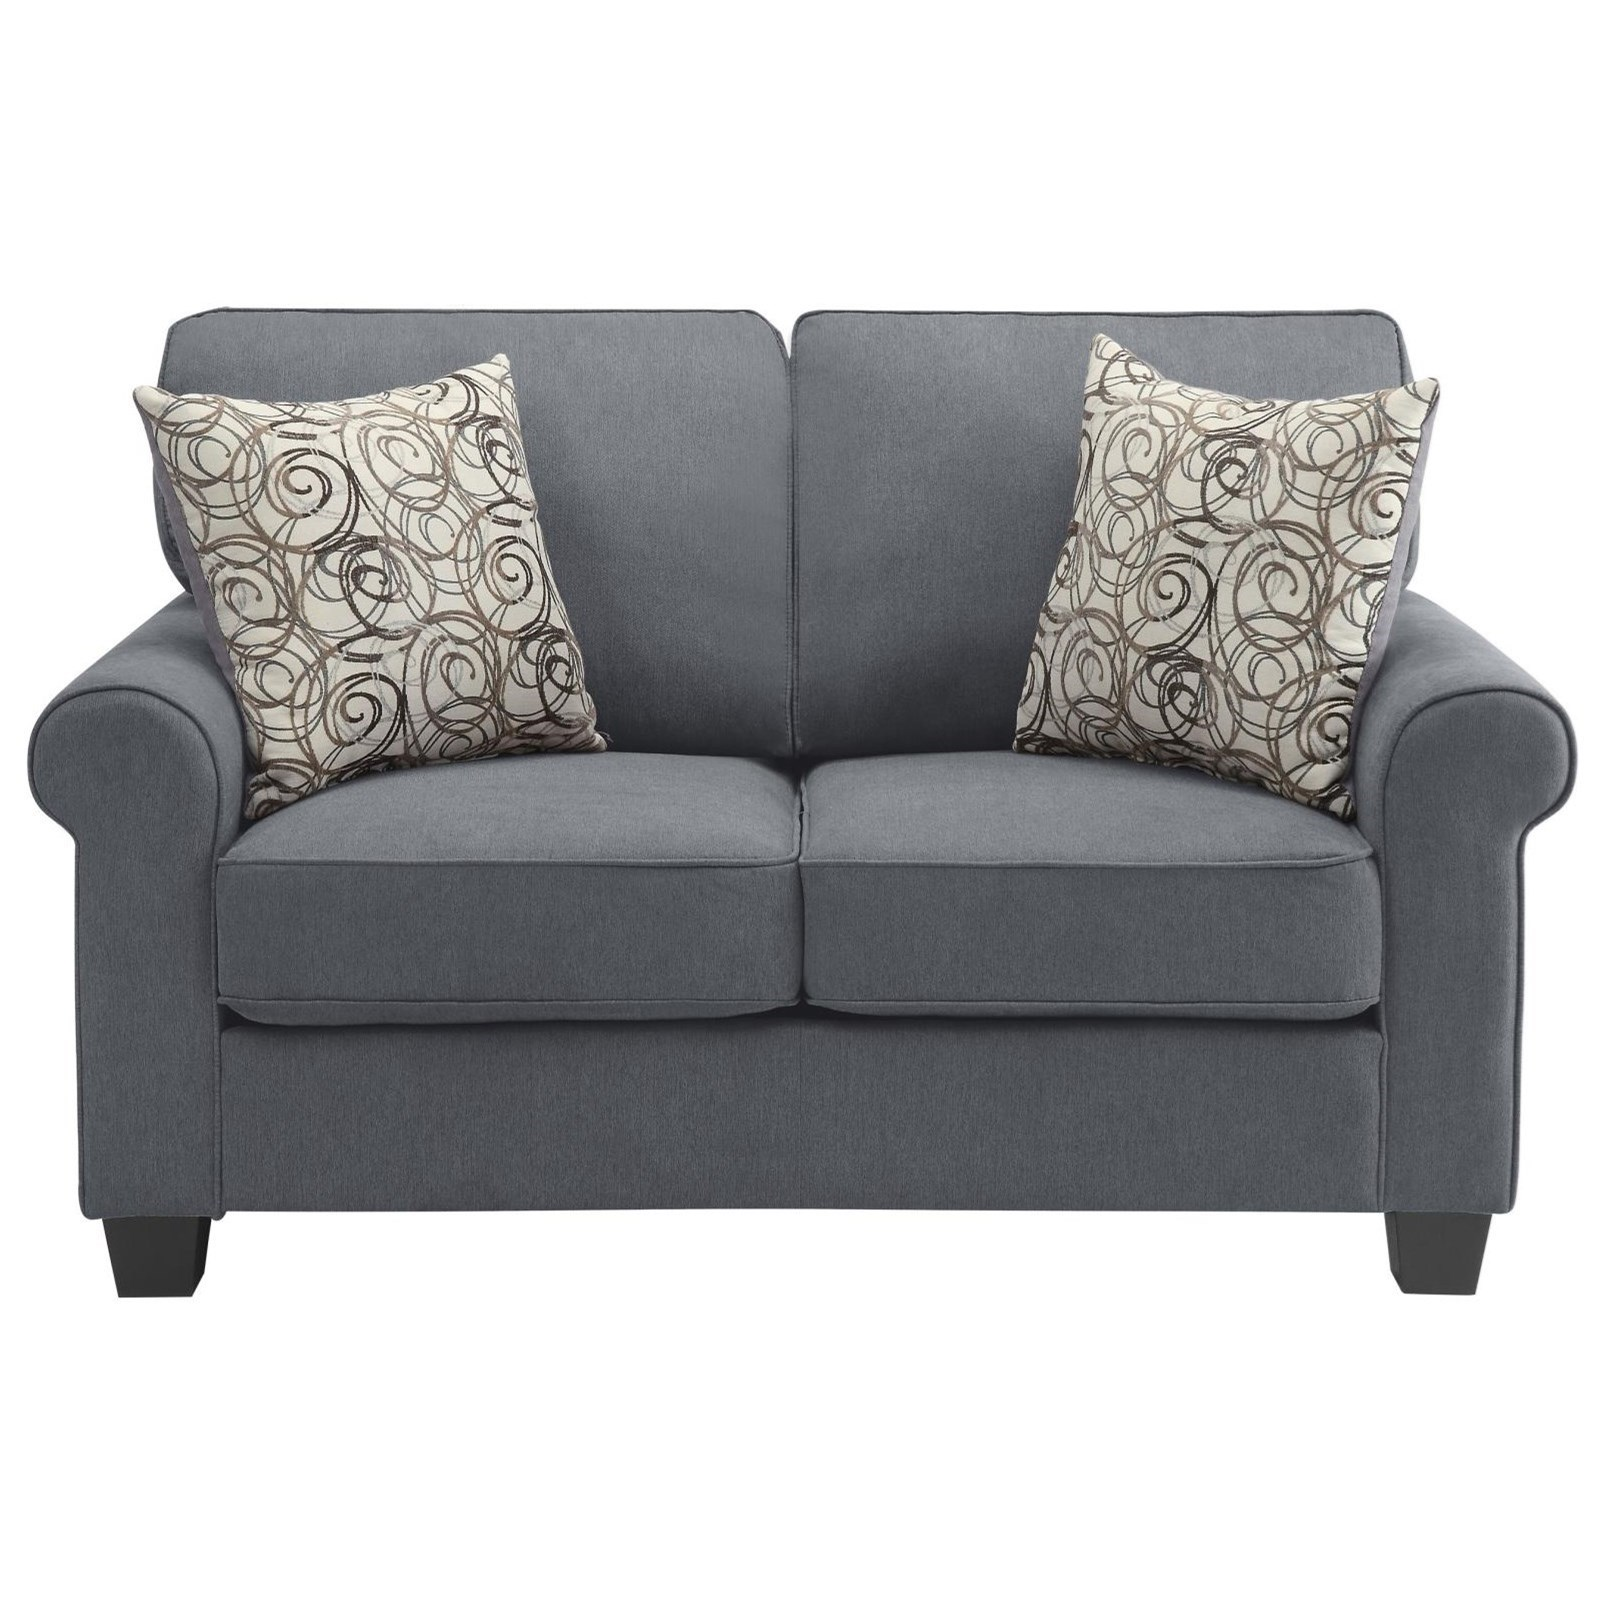 Selkirk Love Seat by Homelegance Furniture at Del Sol Furniture